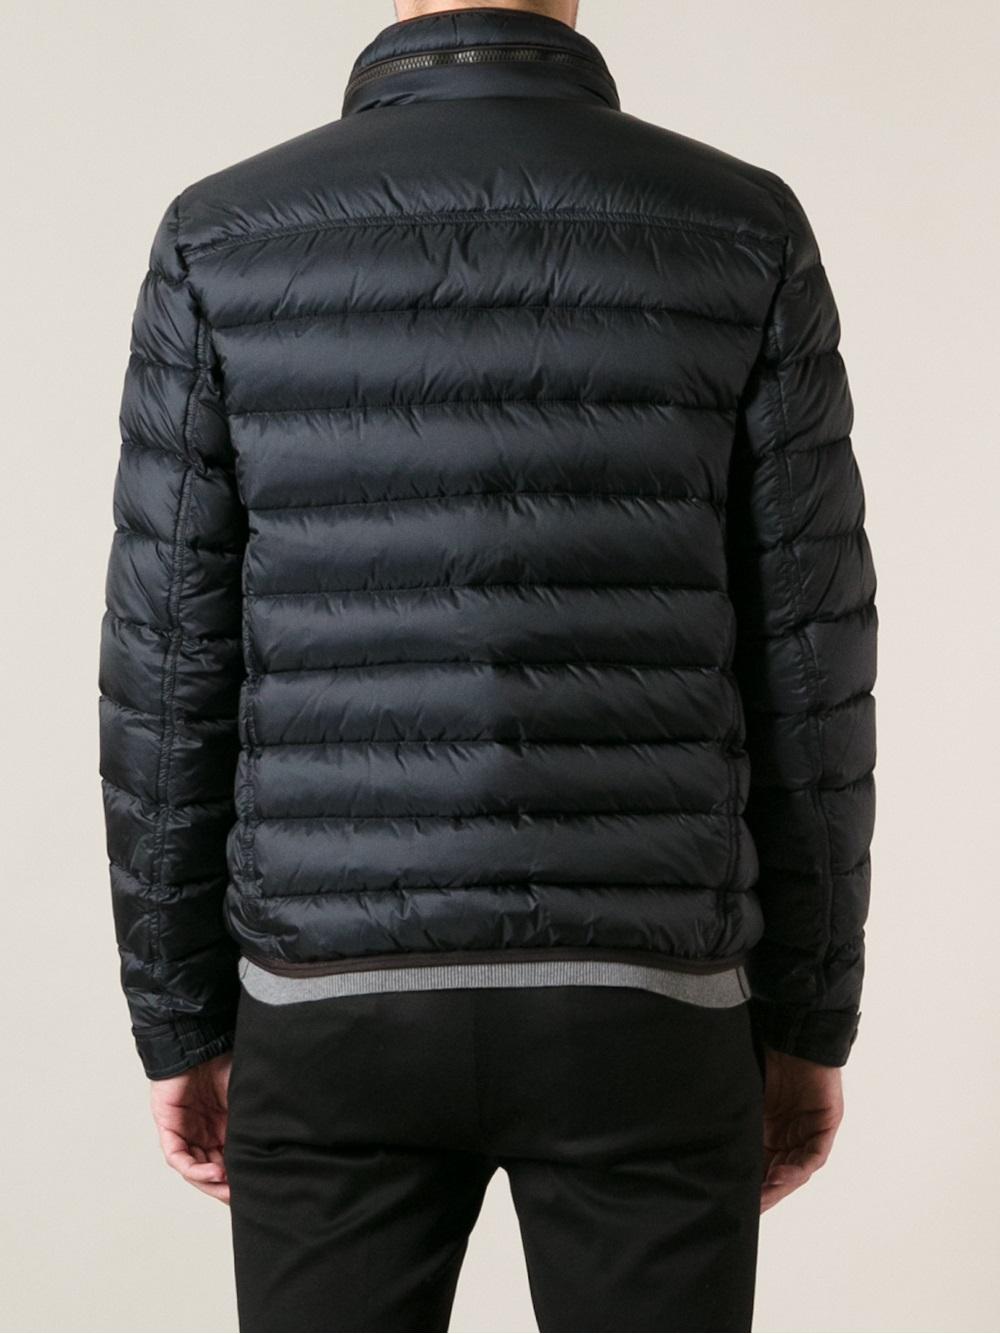 moncler norbert jacket moncler norbert jacket ...